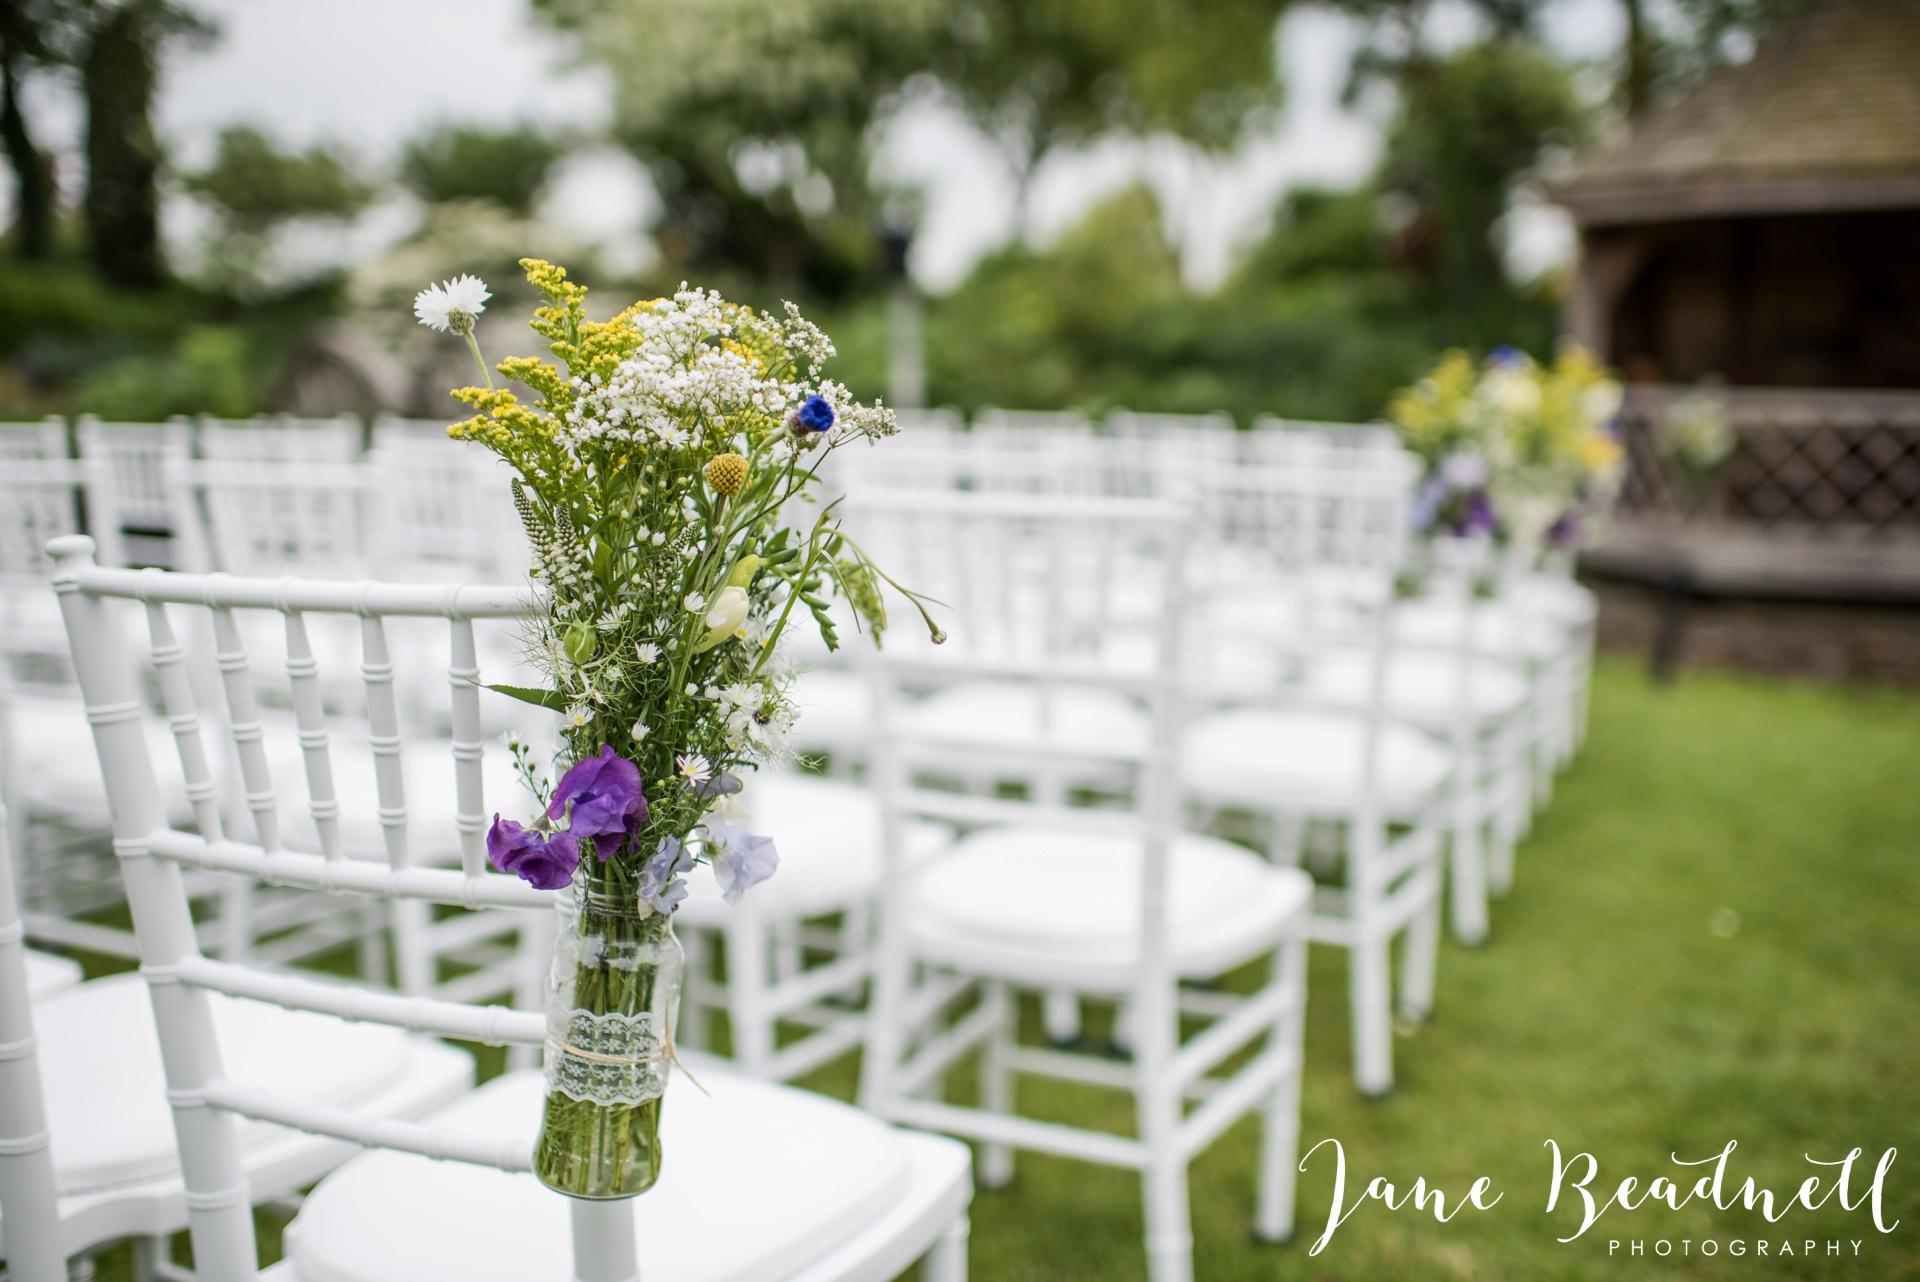 South Farm Wedding photography Hertfordshire by Jane Beadnell Photography fine art wedding photographer_0023